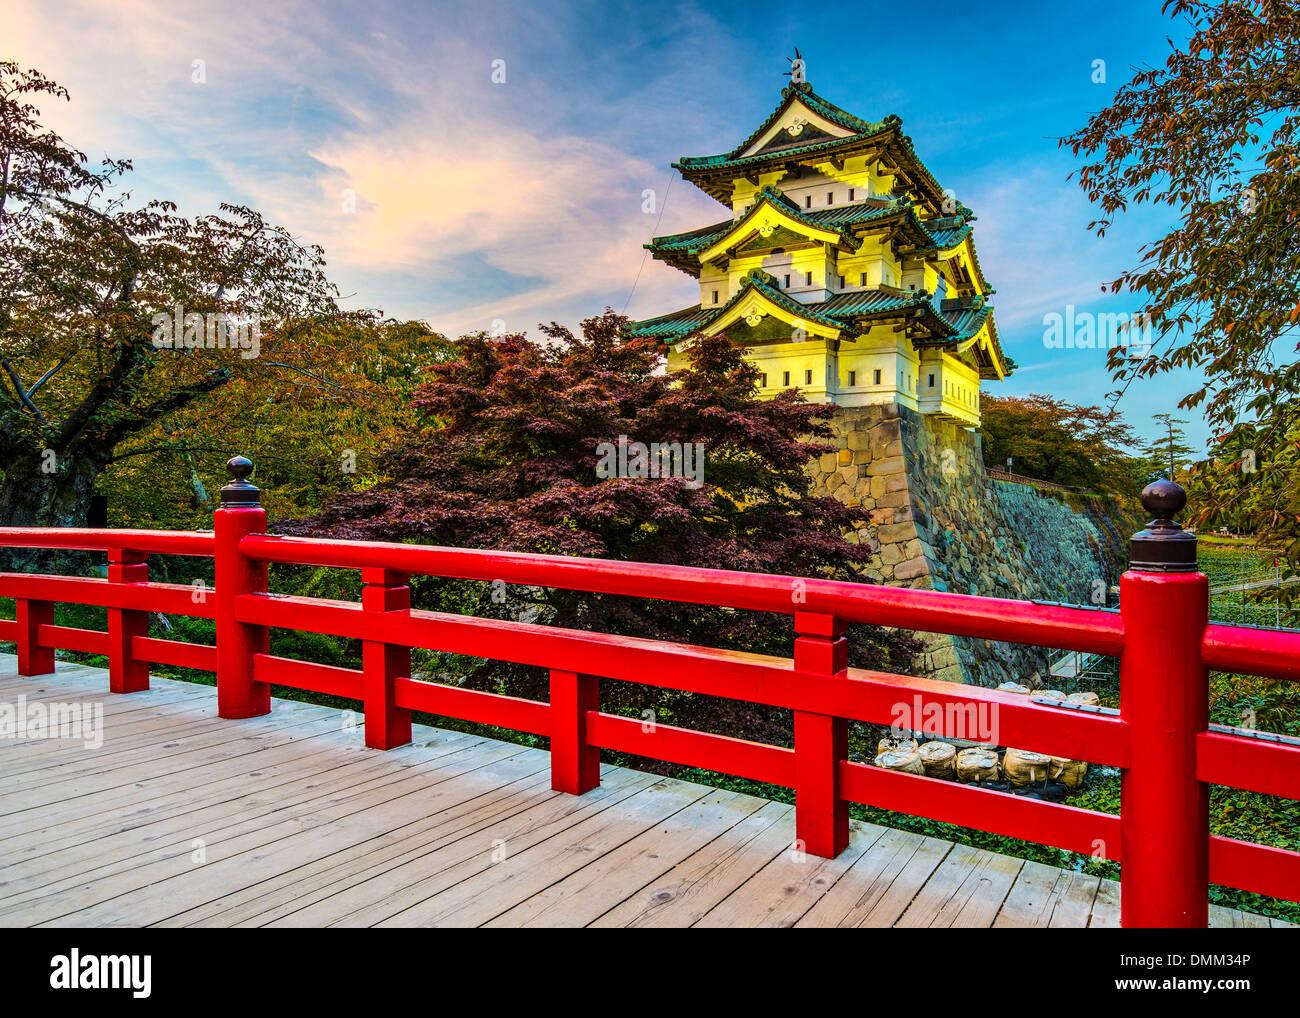 Castillo de Hirosaki en Aomori, Japón. Foto de stock